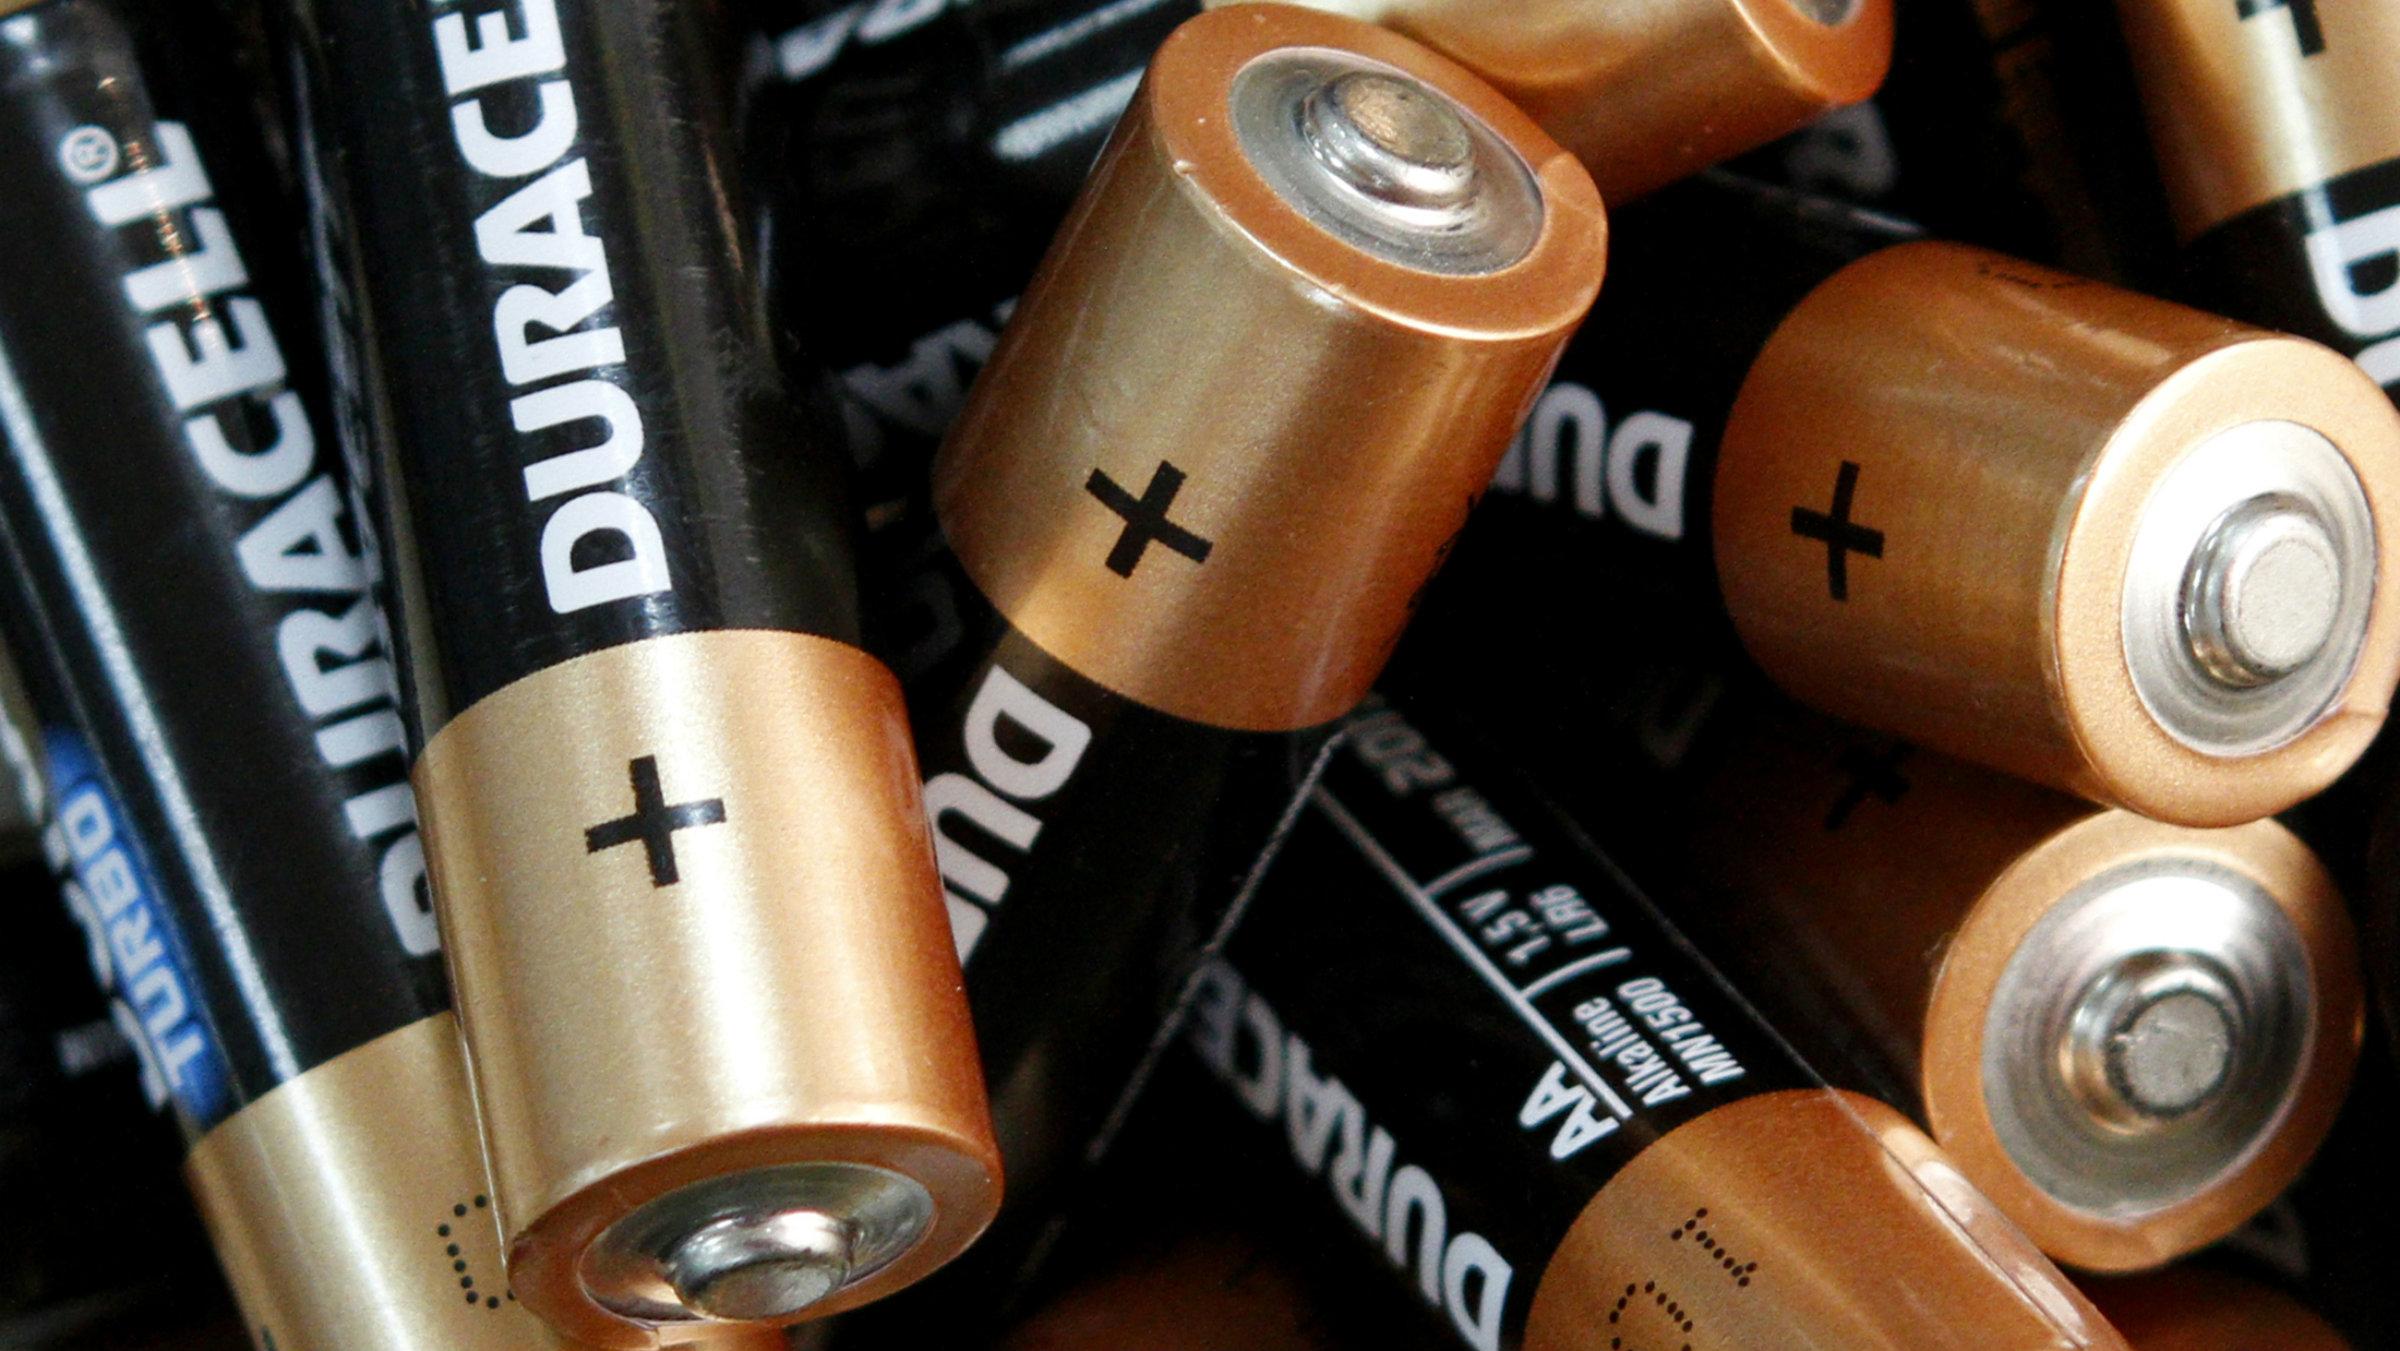 Standard AA batteries.